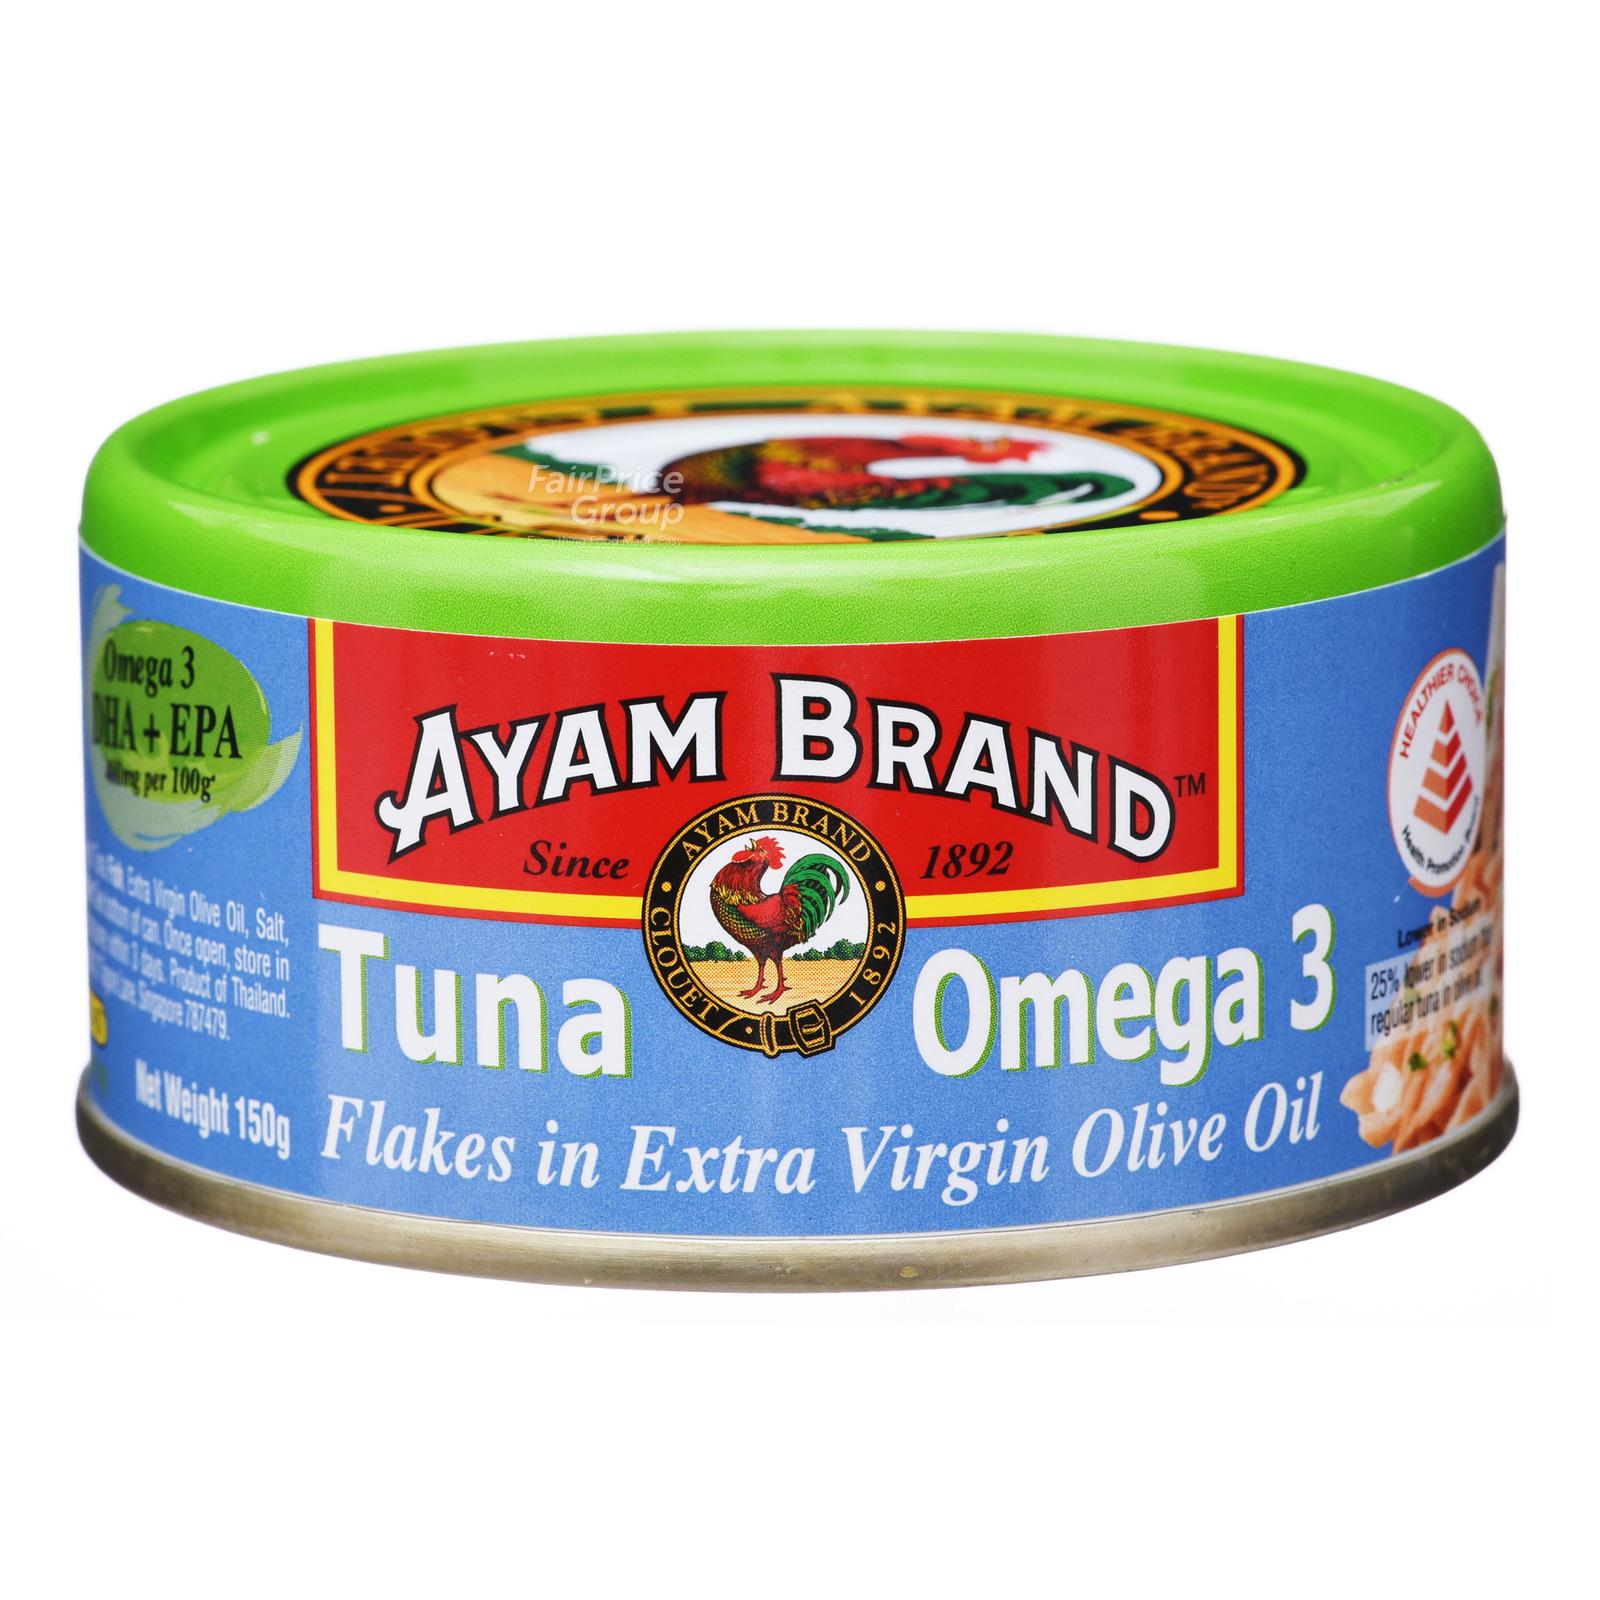 Ayam Brand Tuna Flakes - Extra Virgin Olive Oil (Omega 3)